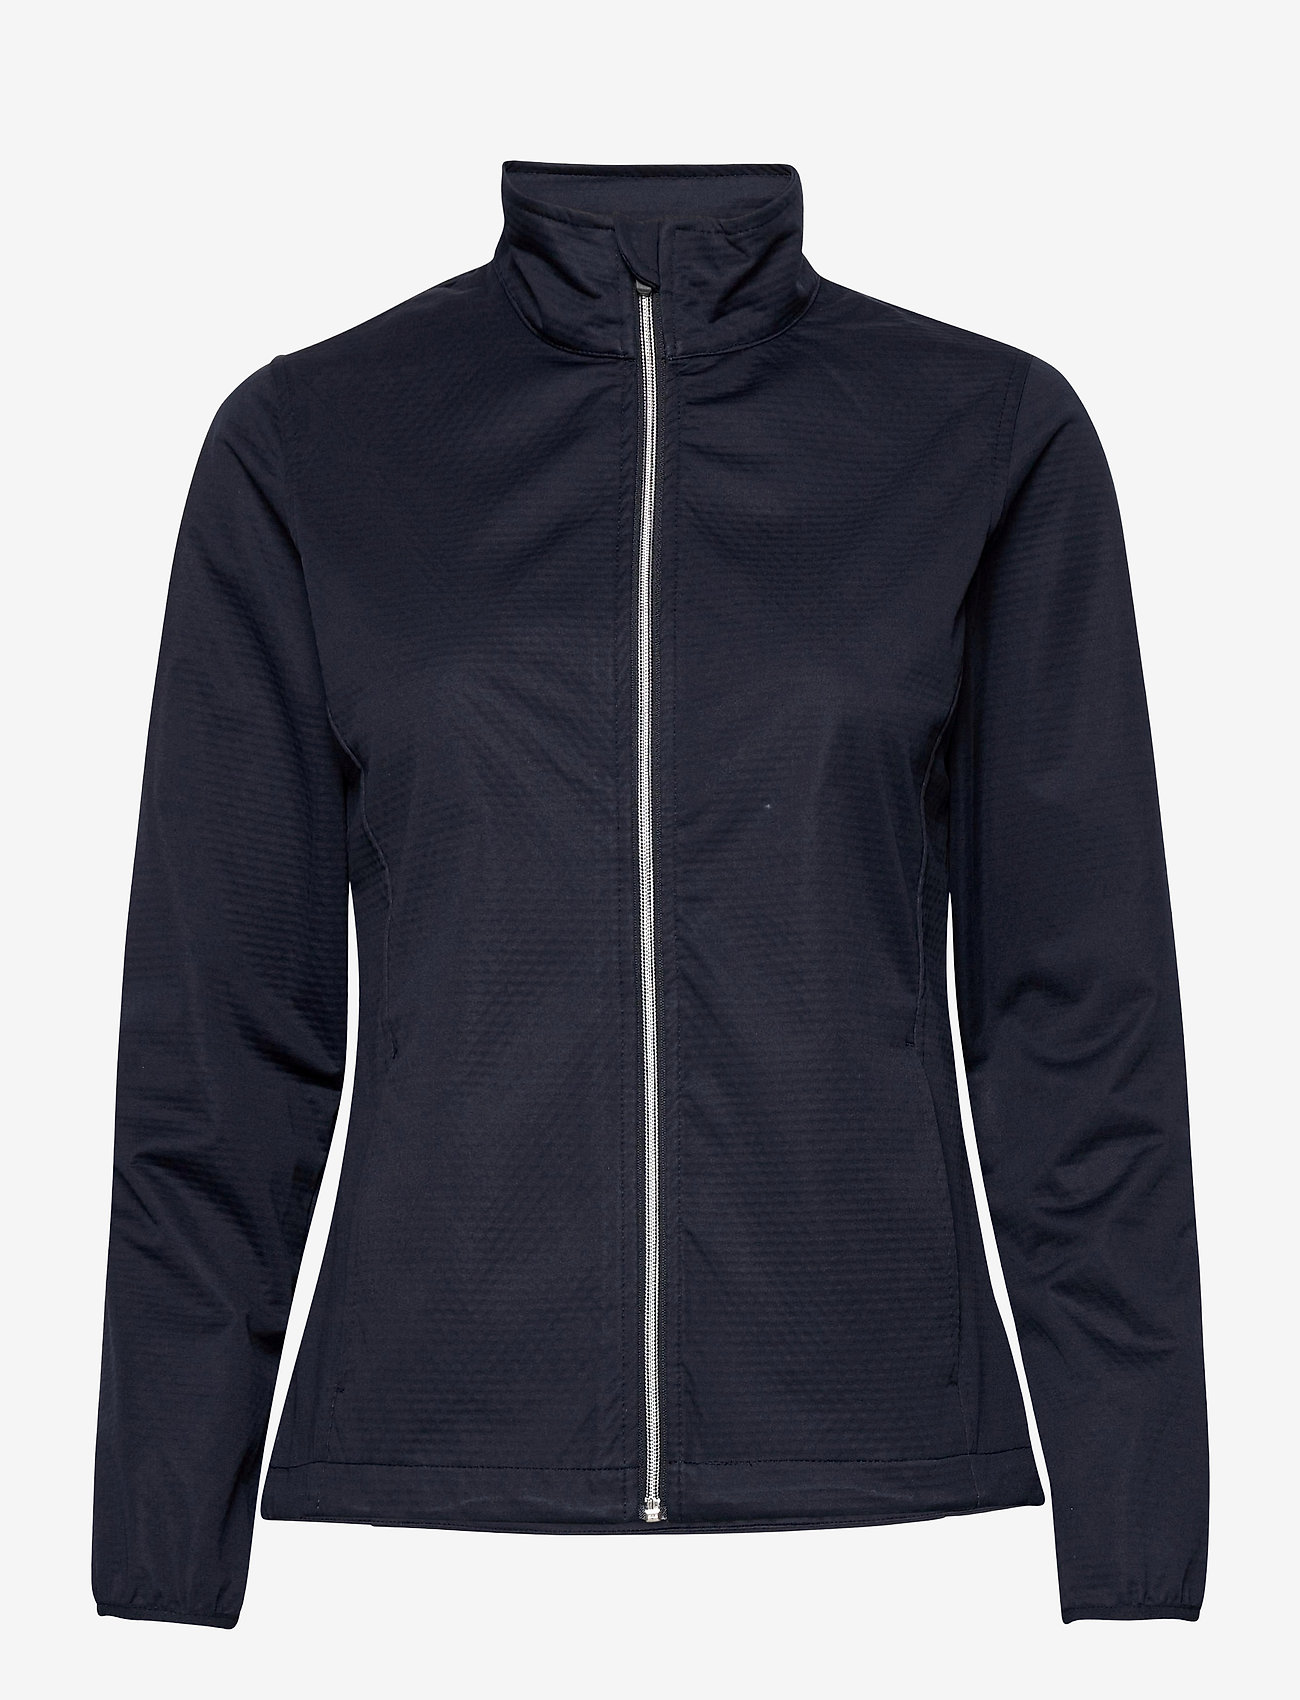 Abacus - Lds Lytham softshell jacket - golf jassen - navy - 0